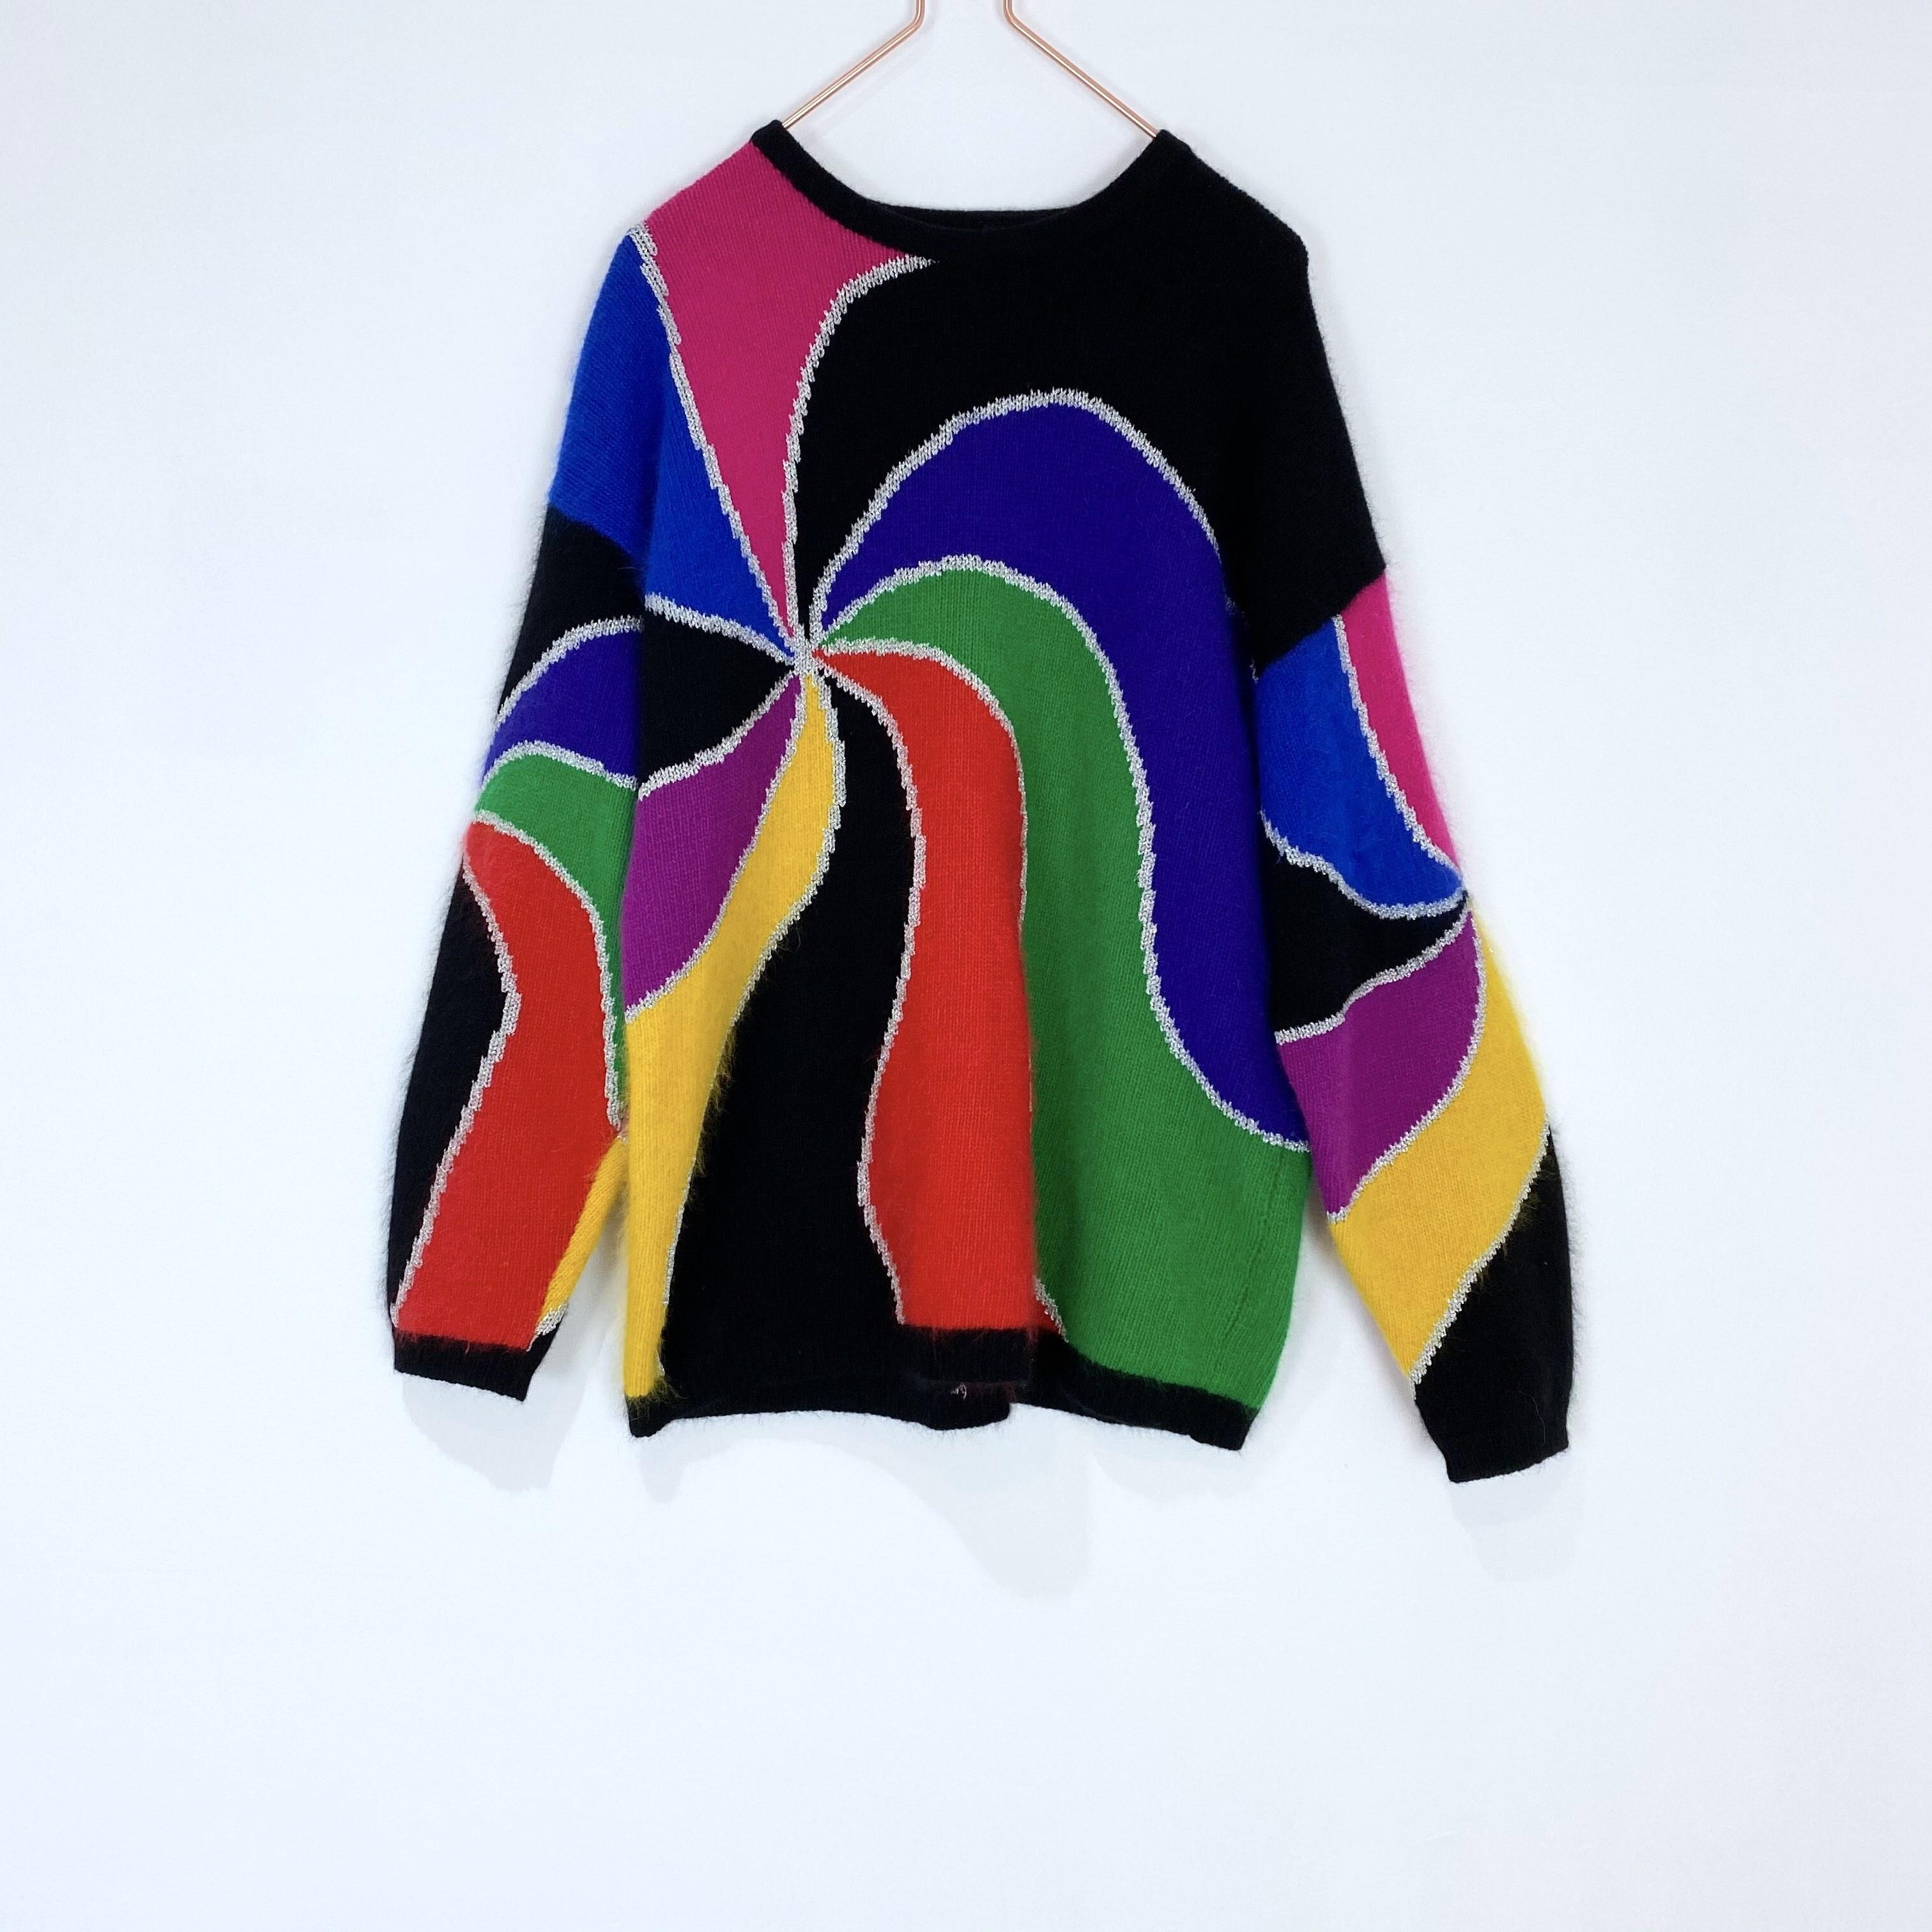 ◼︎80s vintage angola blend tornado sweater from U.S.A.◼︎